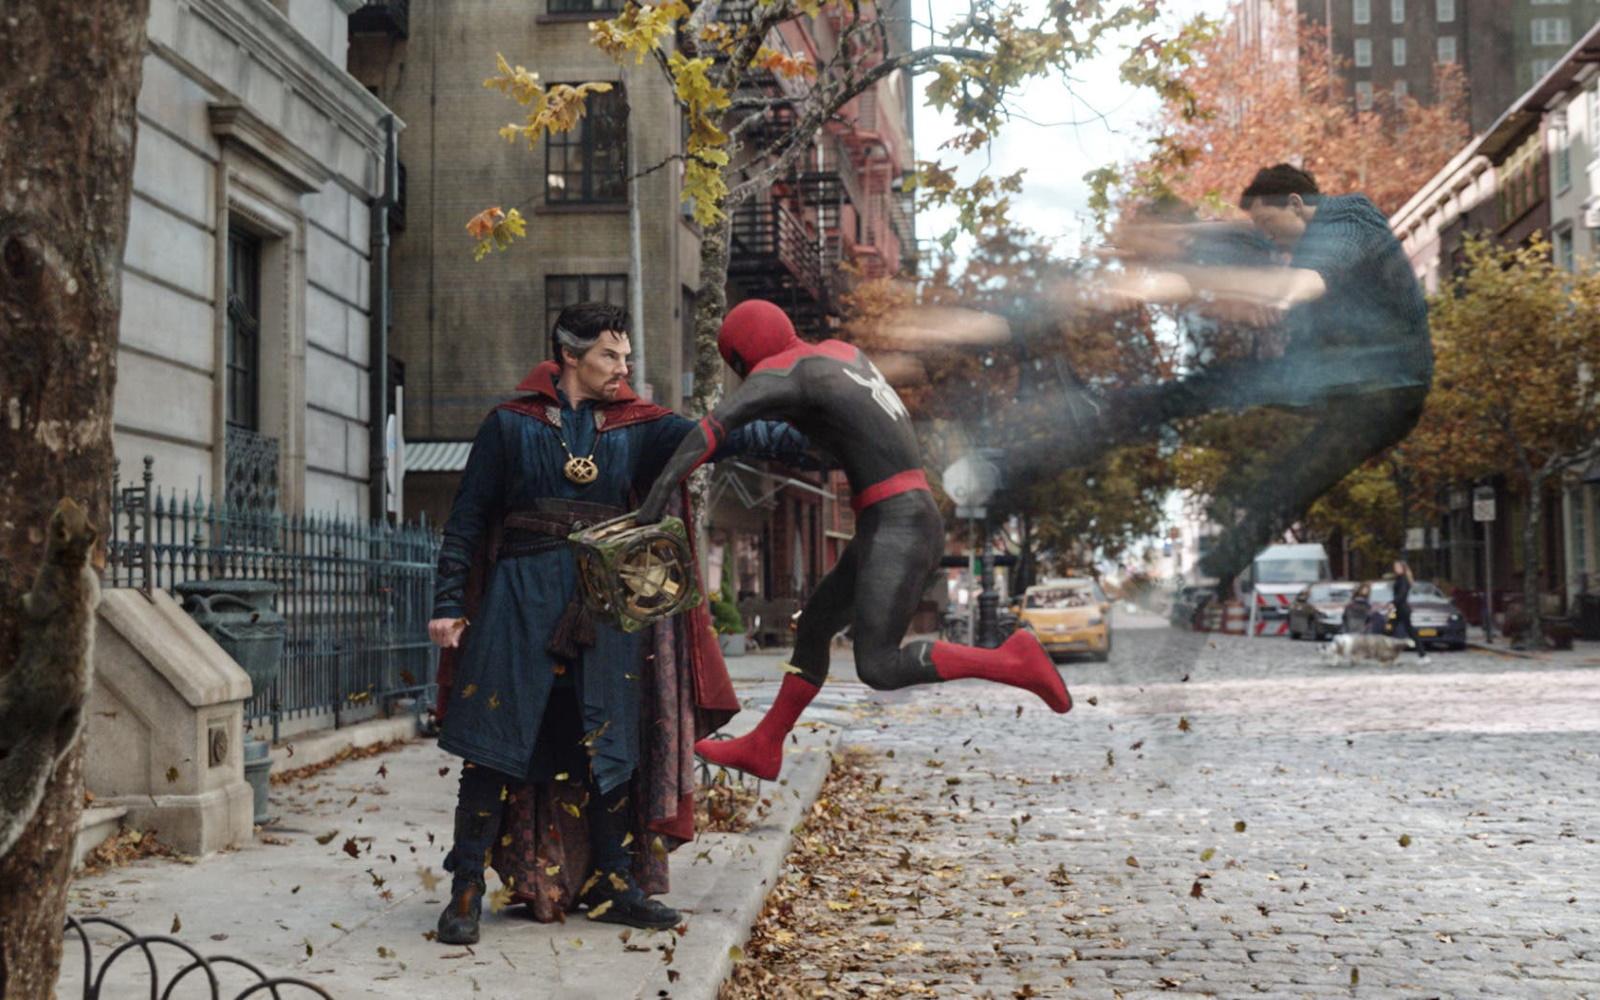 Worlds Collide In The Spider-Man: No Way Home Trailer